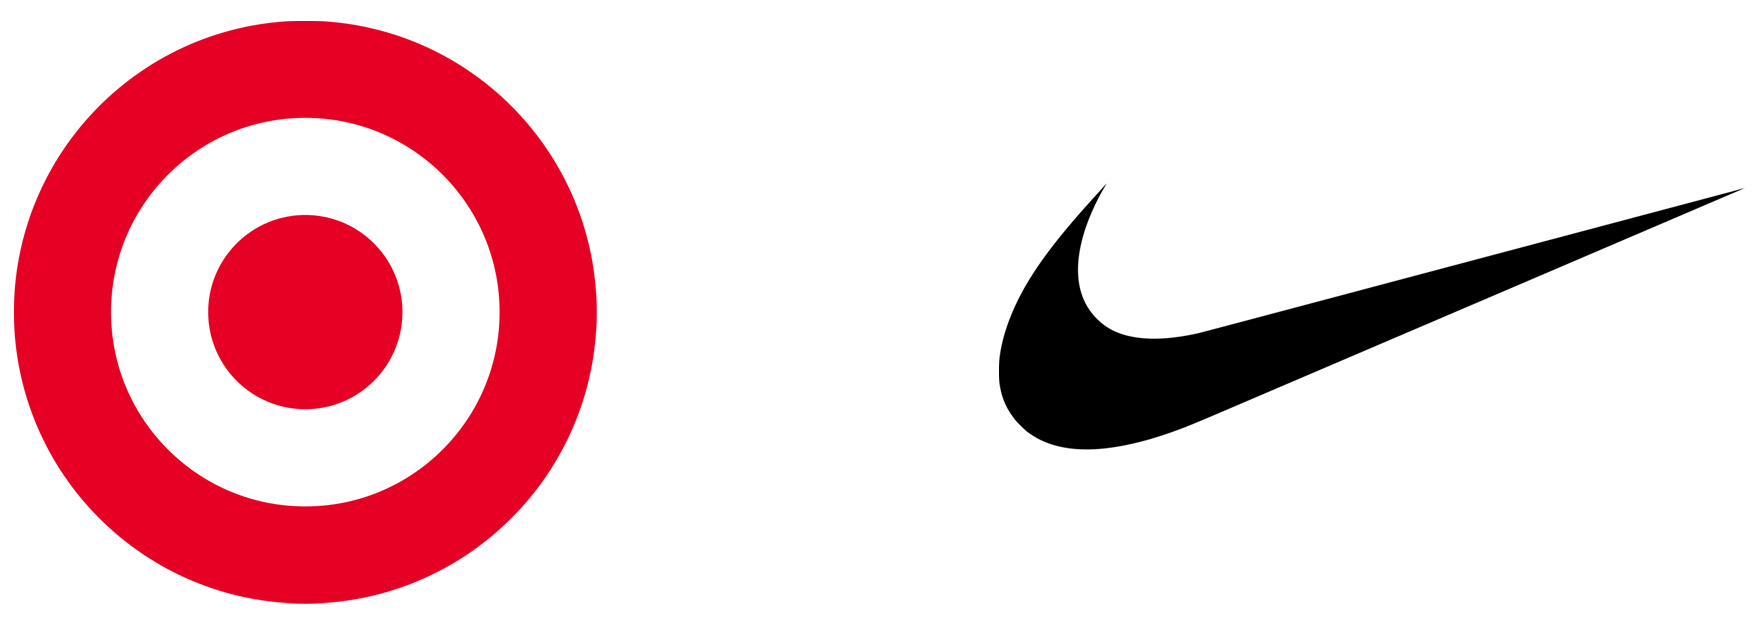 negative space logo design with michael bierut 99 invisible